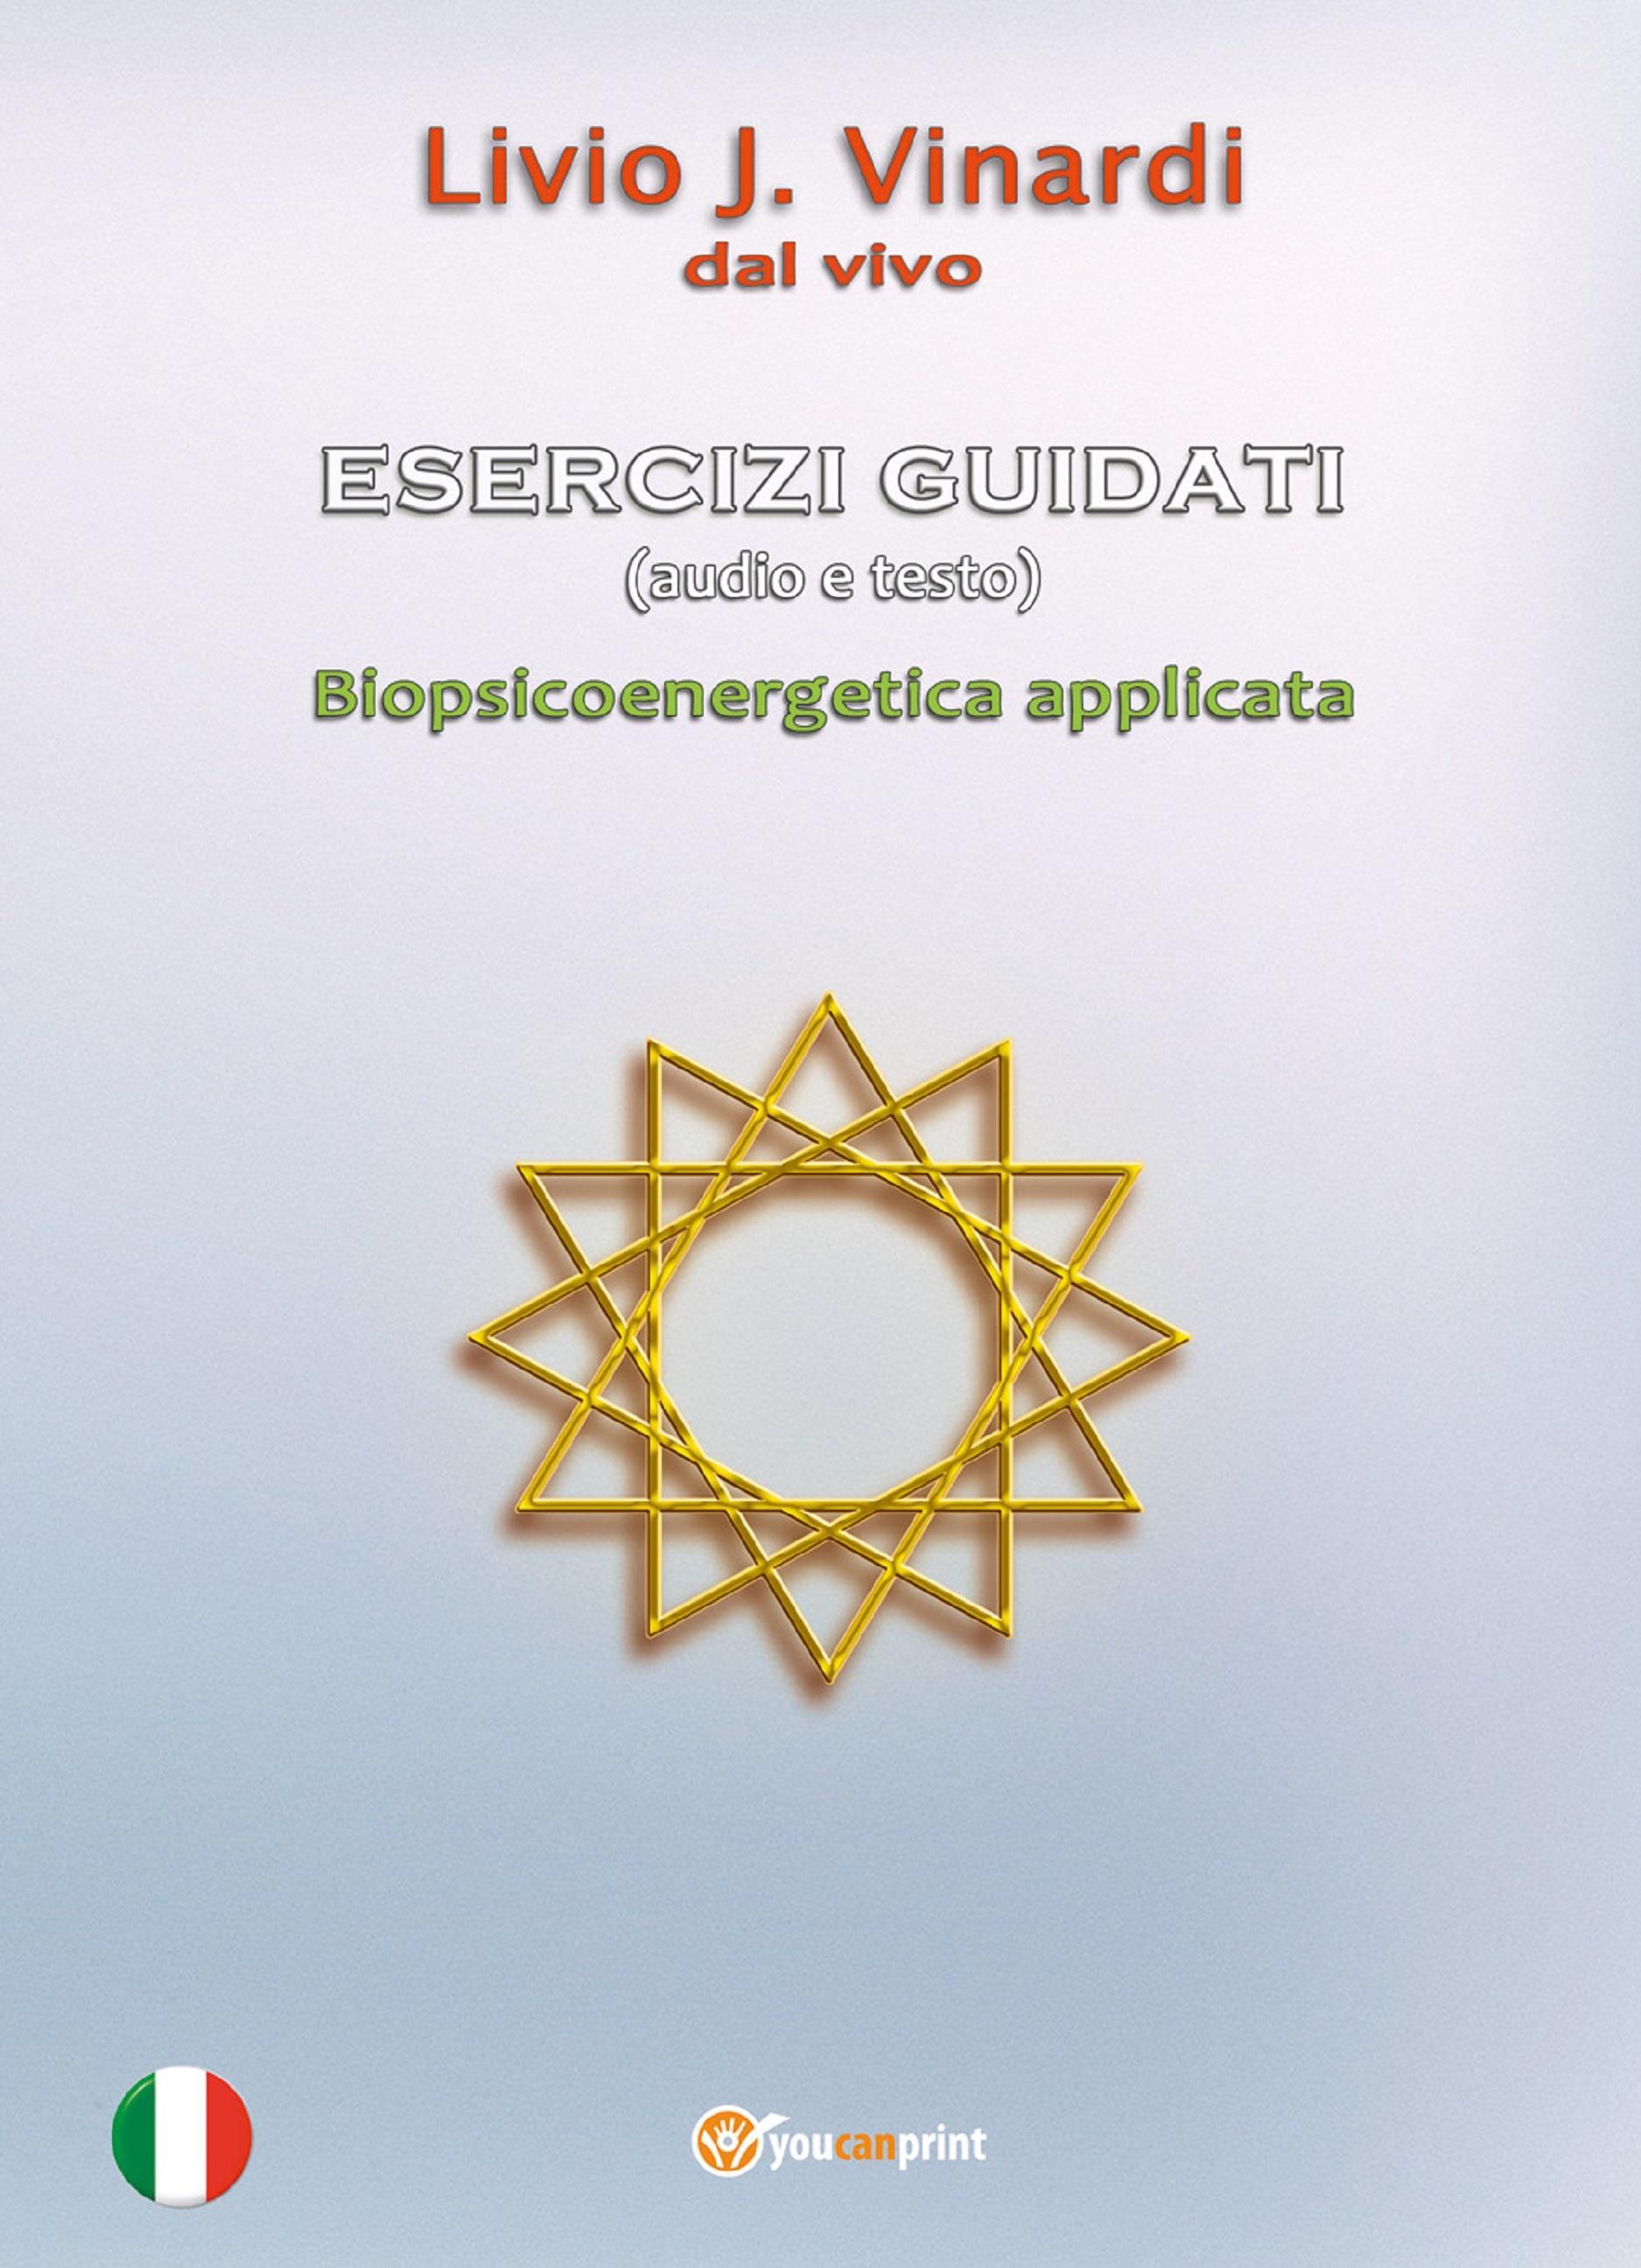 ESERCIZI GUIDATI (audio e testo) - Biopsicoenergetica applicata